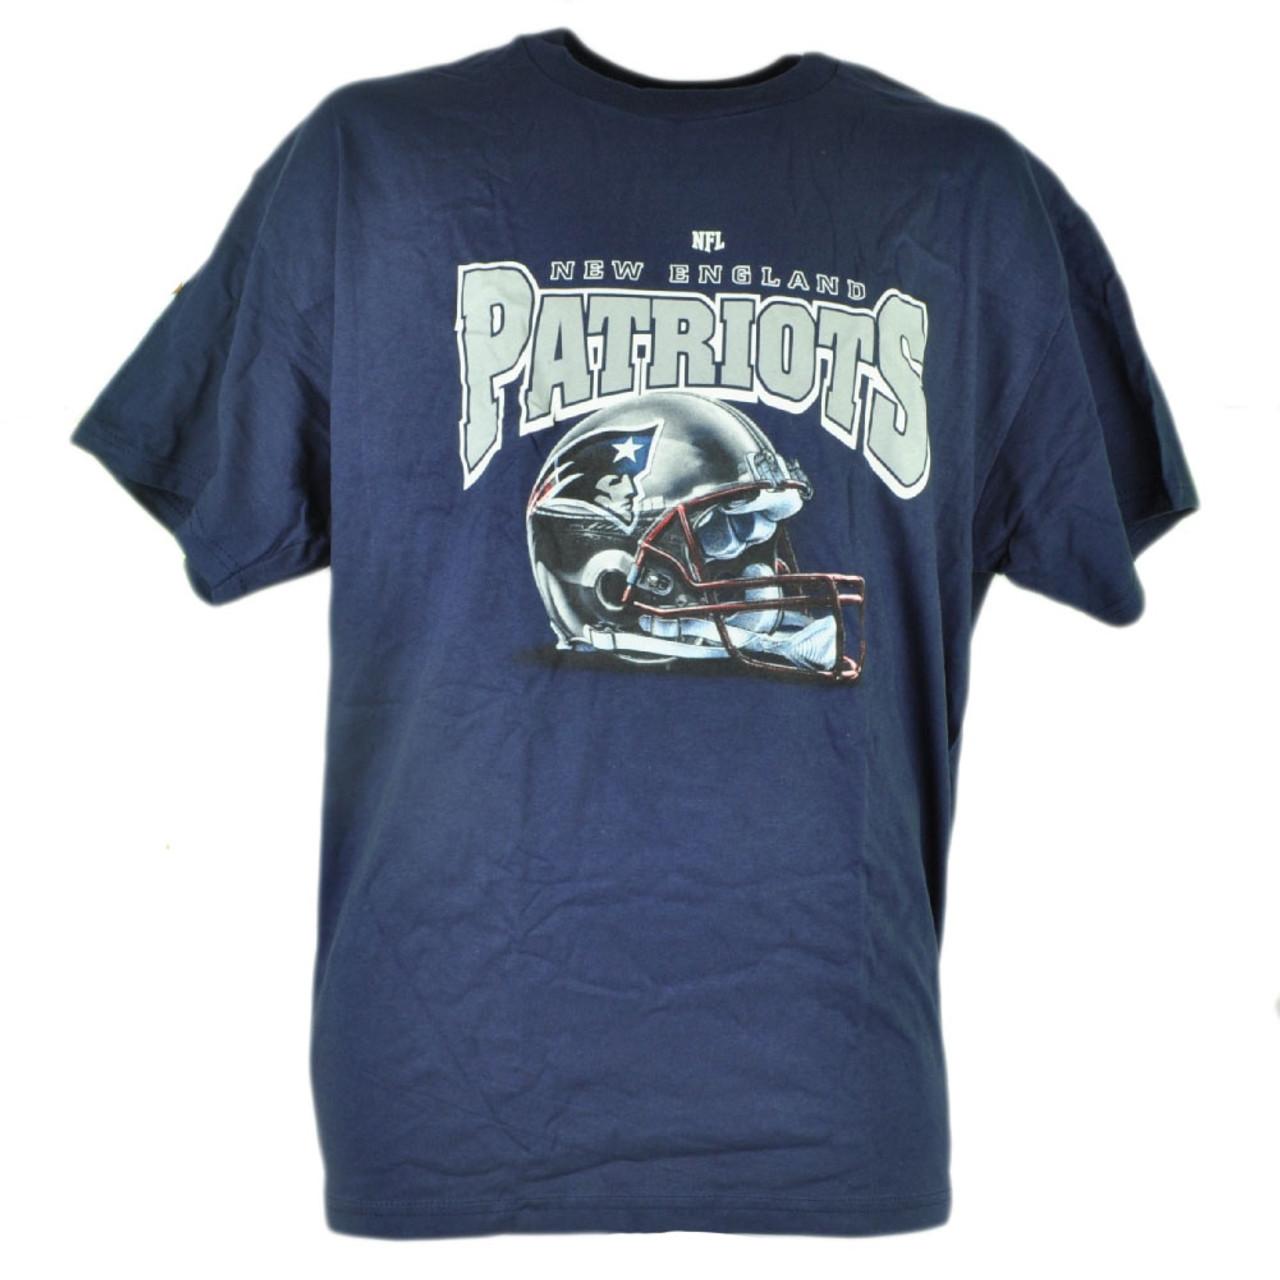 bfe54f5e9 NFL New England Patriots Tshirt Cup 2 Set Navy Blue Shirt Tee Mug Short  Sleeve